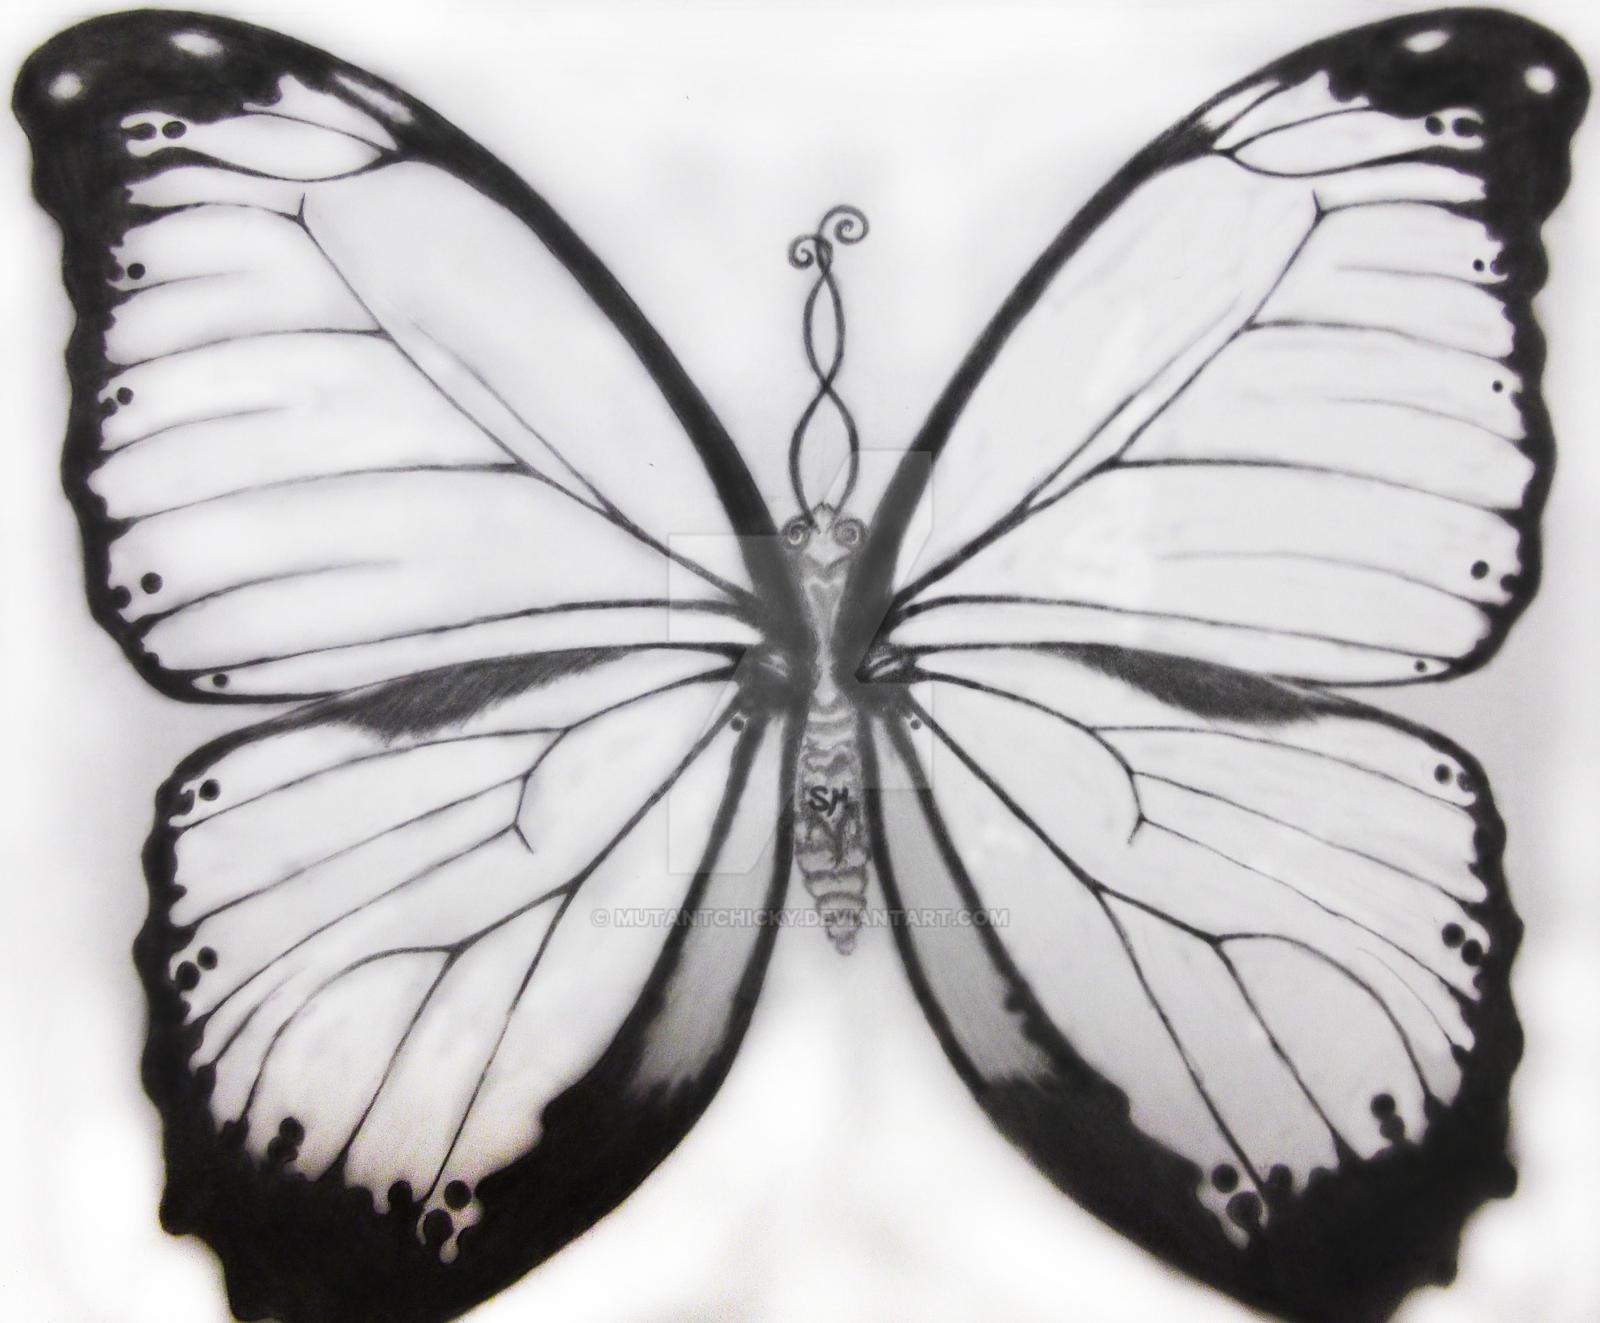 754ecb14410b5 sidneys butterfly tattoo sketch by MutantChicky sidneys butterfly tattoo  sketch by MutantChicky